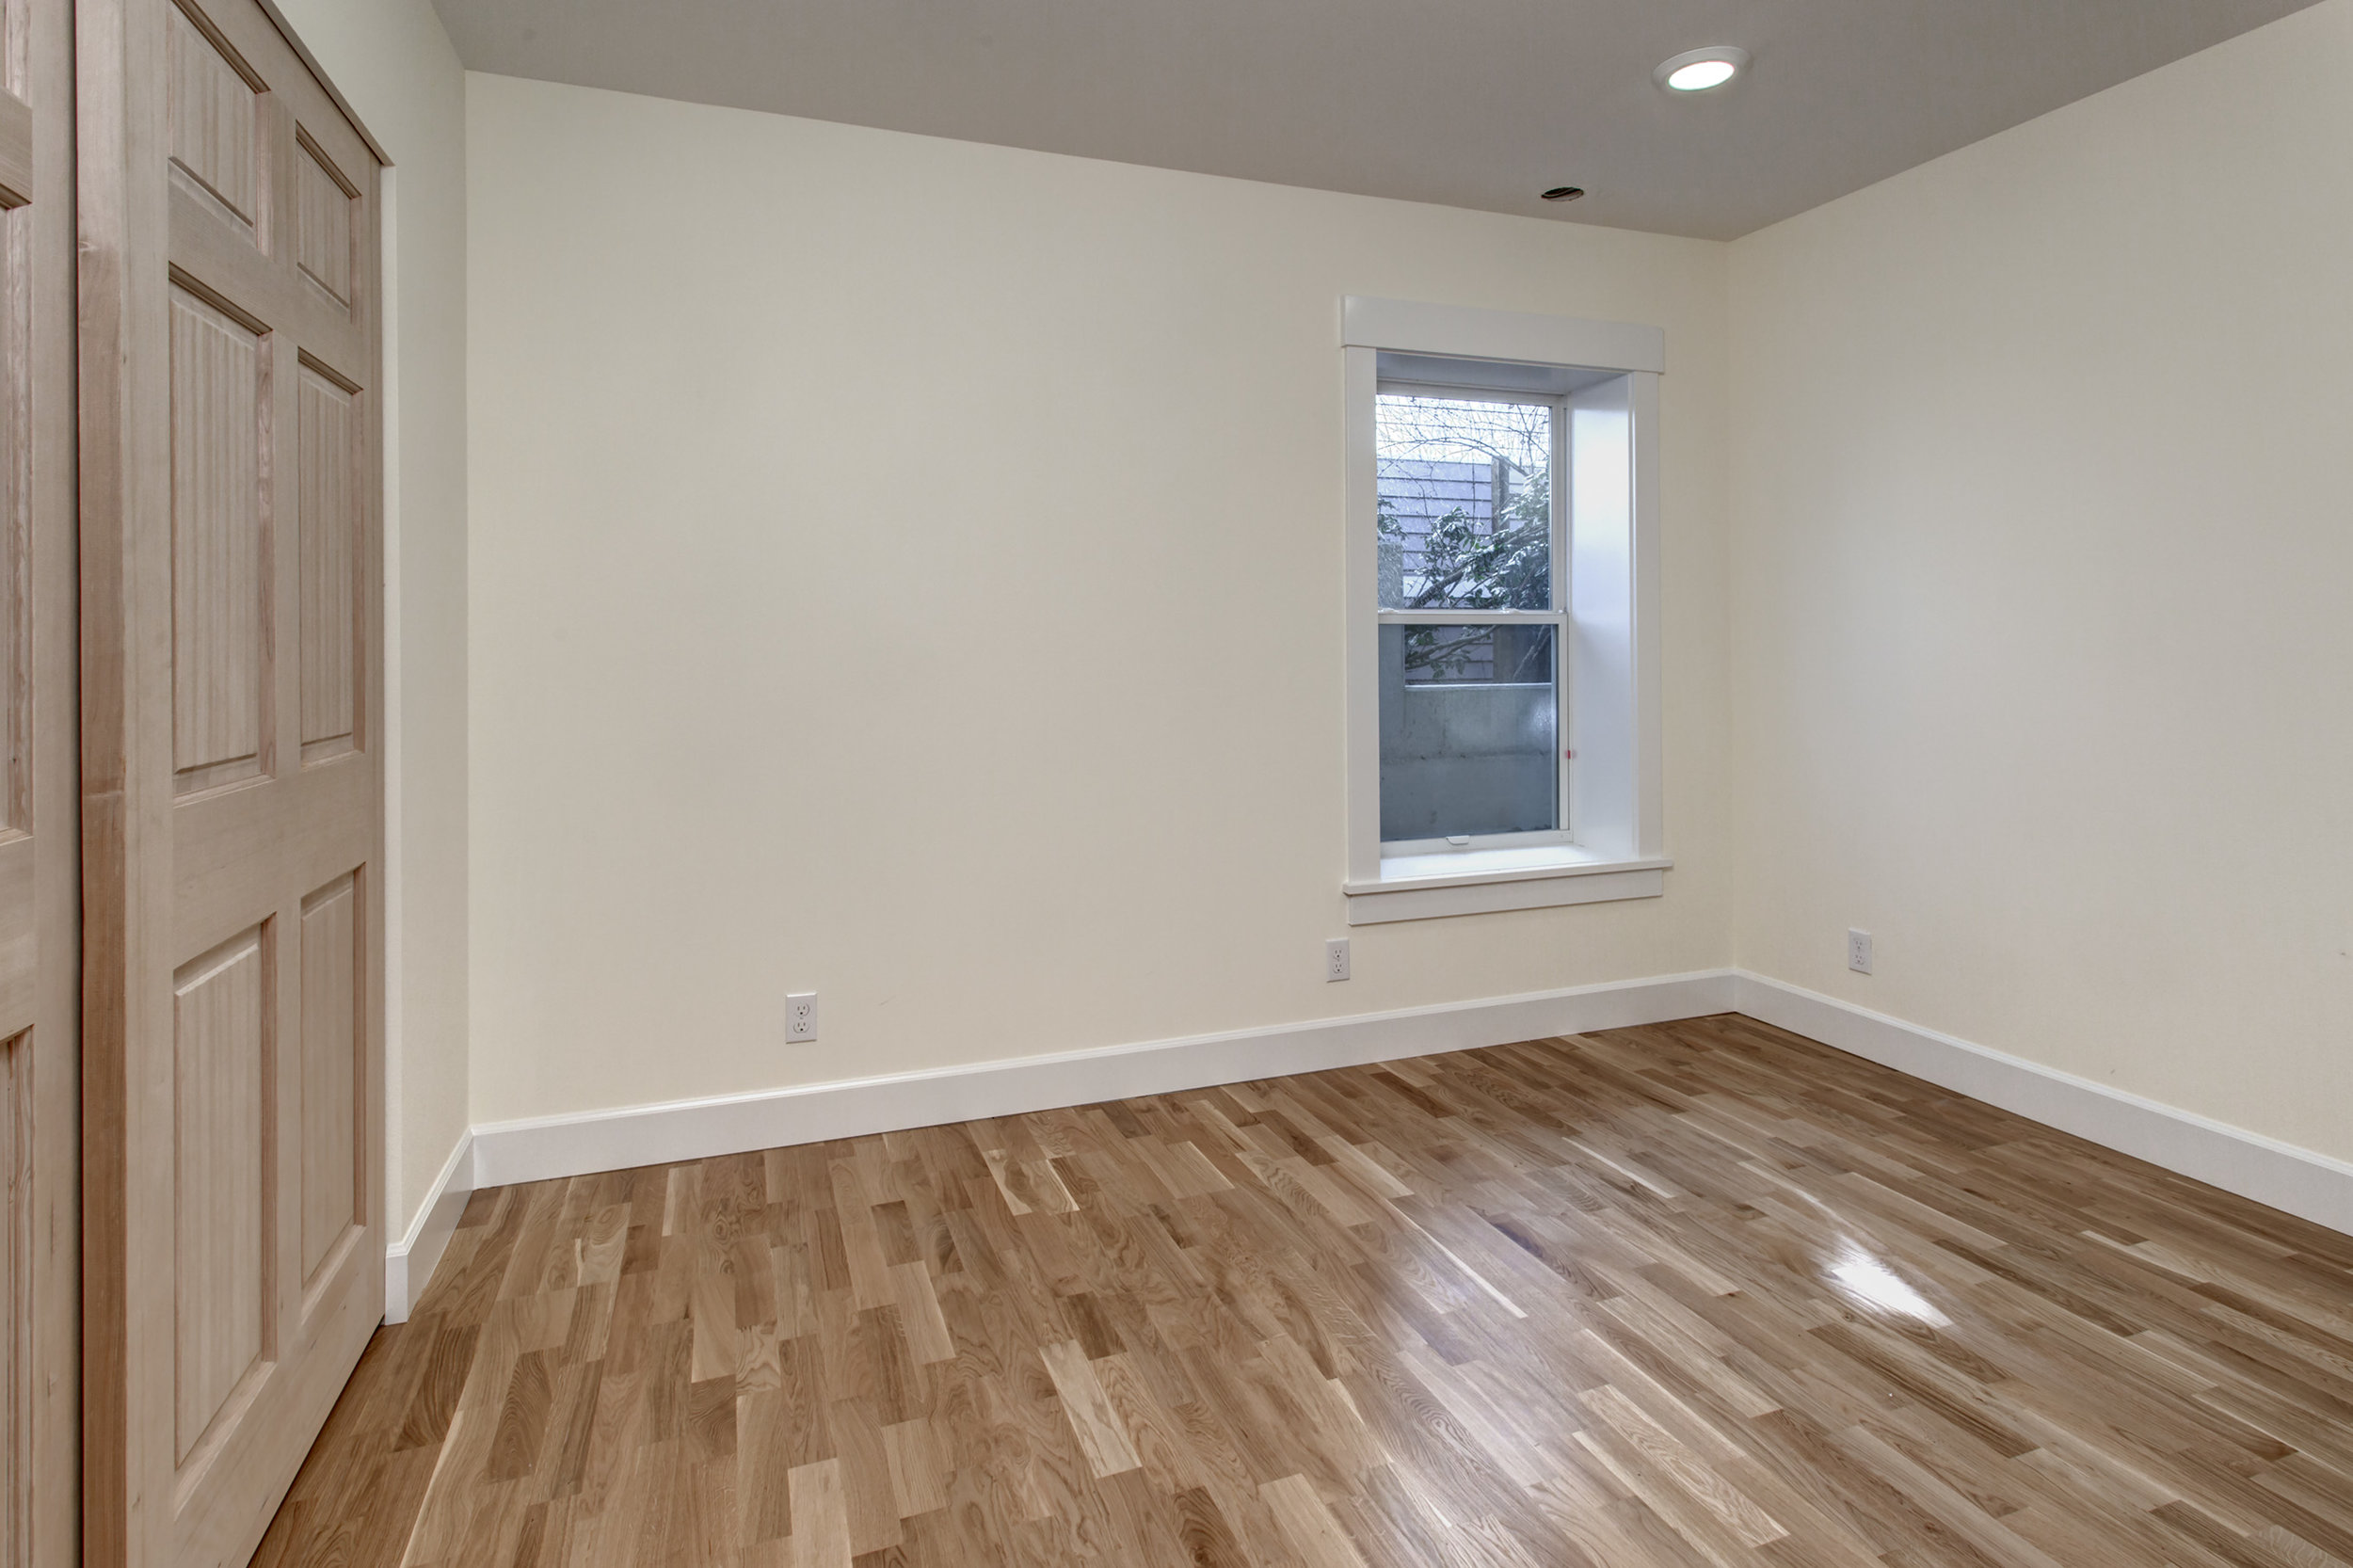 12-Bedroom02.jpg